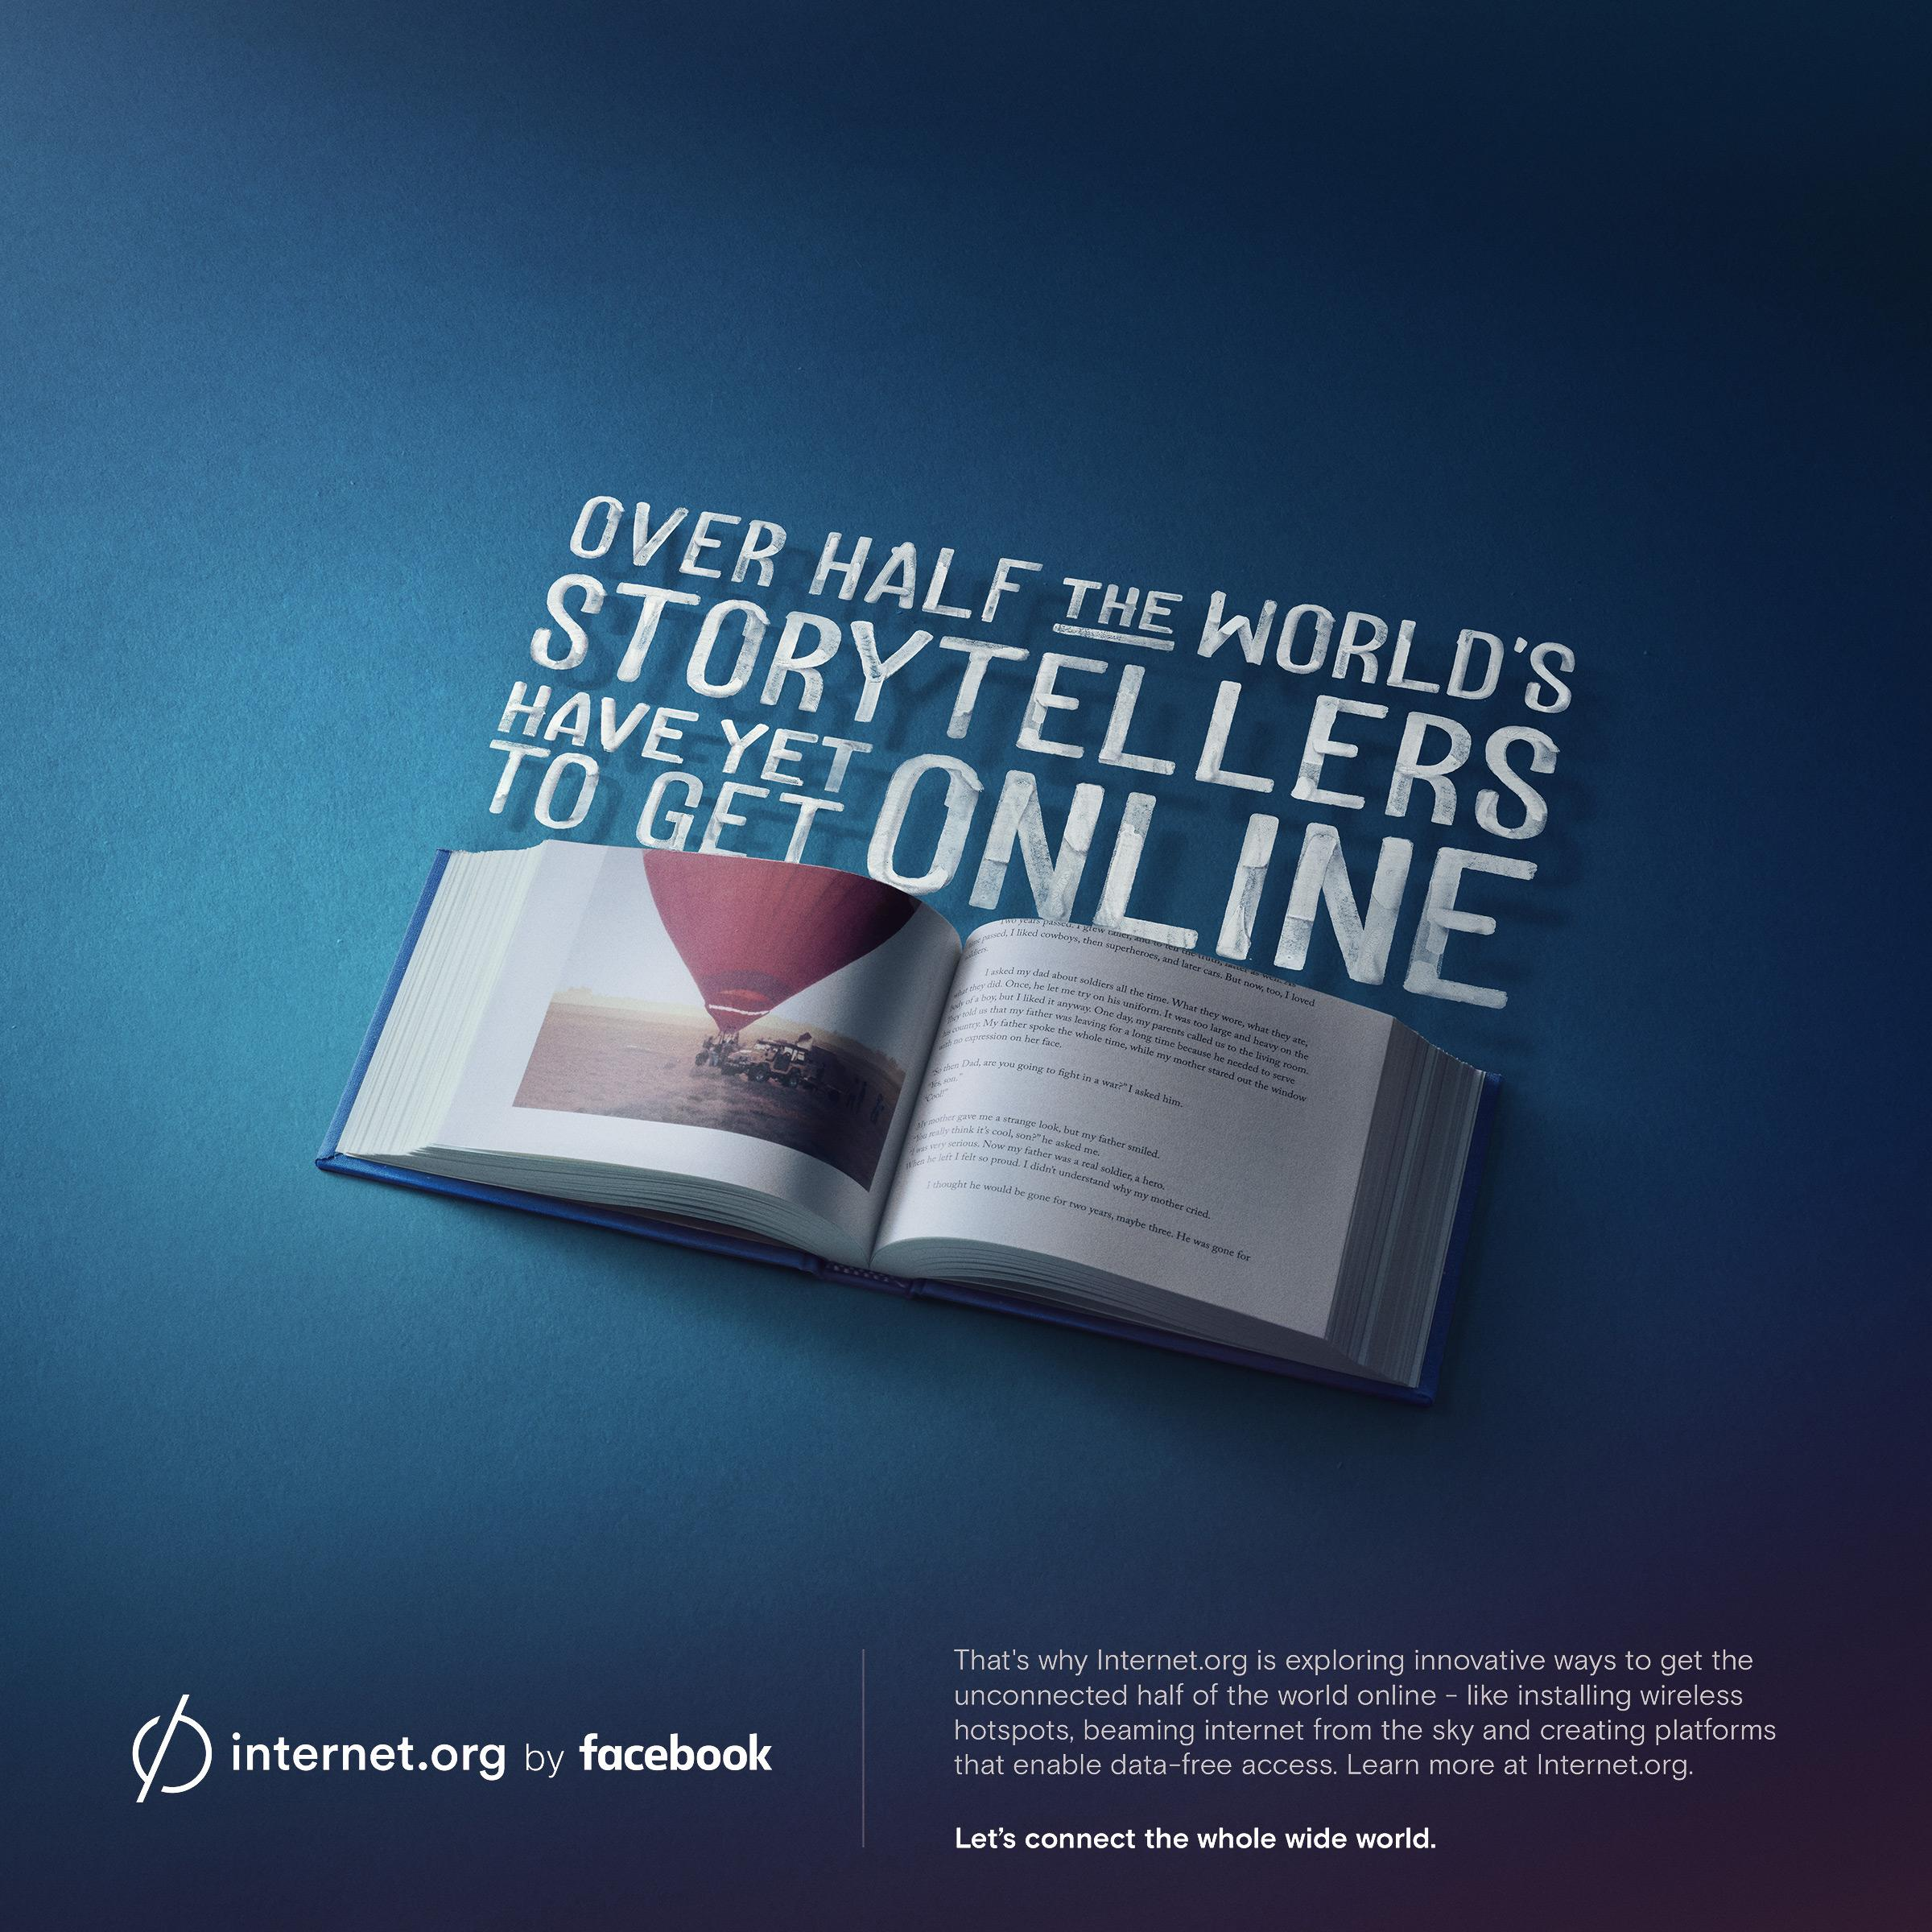 Facebook Print Ad - internet.org - Storytellers